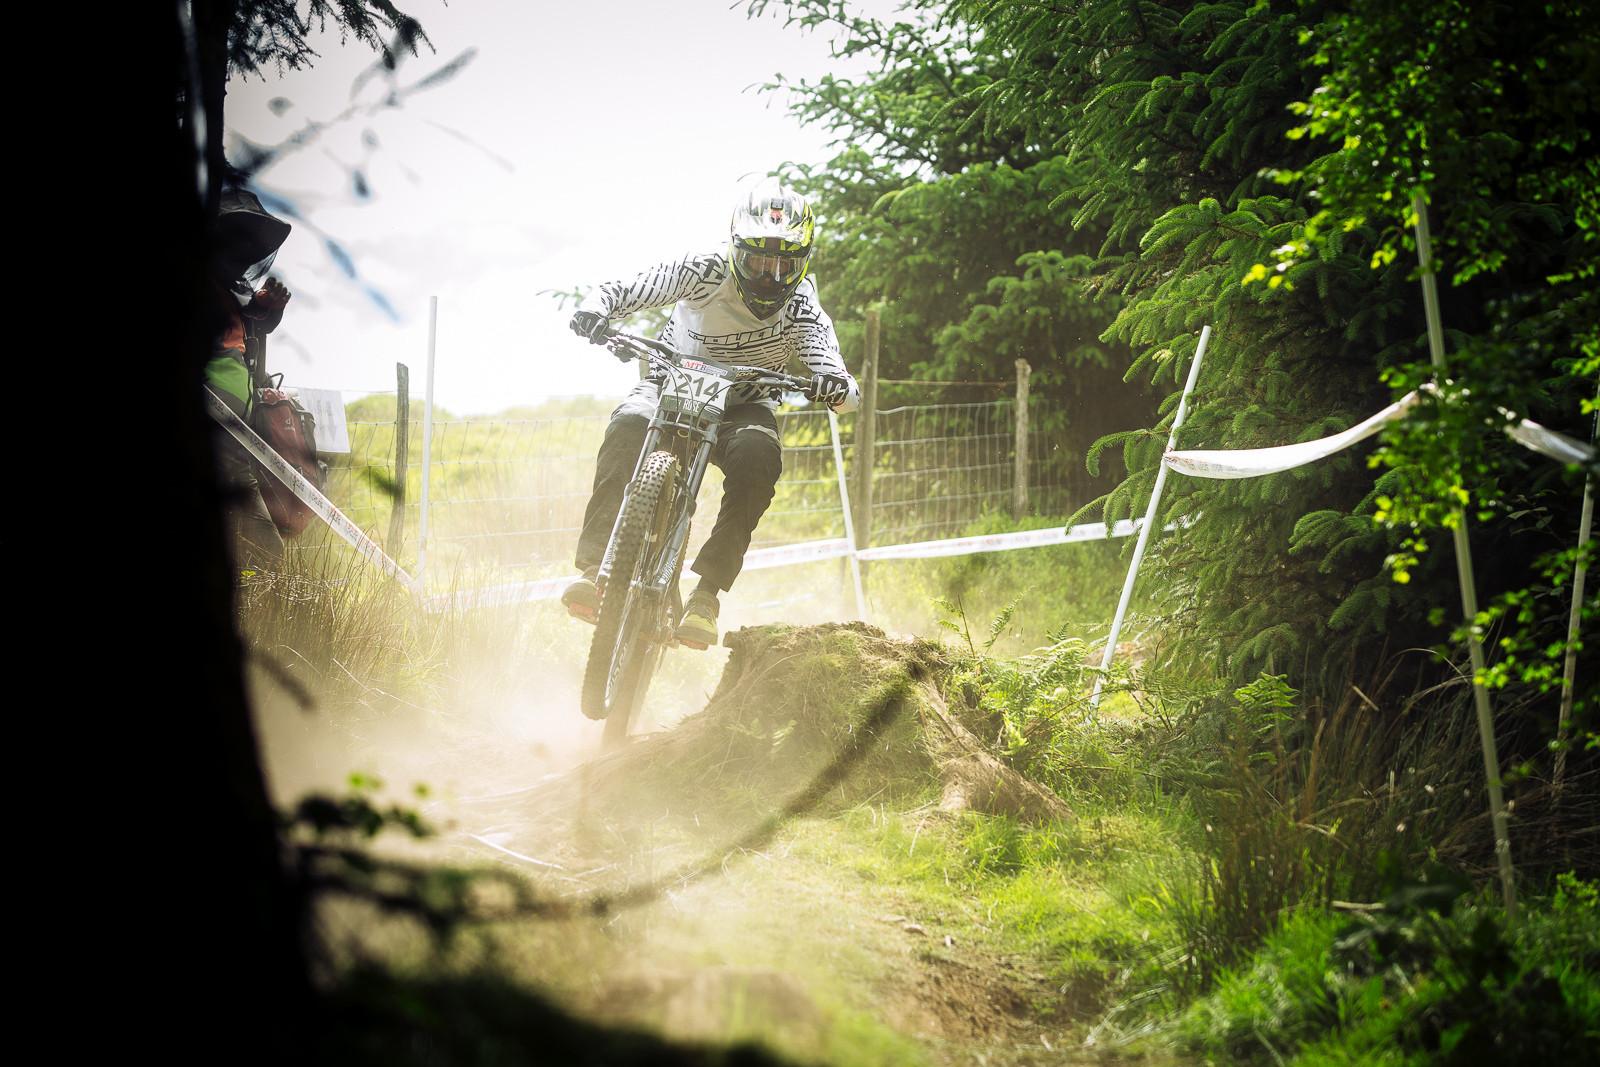 Perry Gardiner, British DH Series, Bala - RACE REPORT - 2015 British Downhill Series Bala - Mountain Biking Pictures - Vital MTB